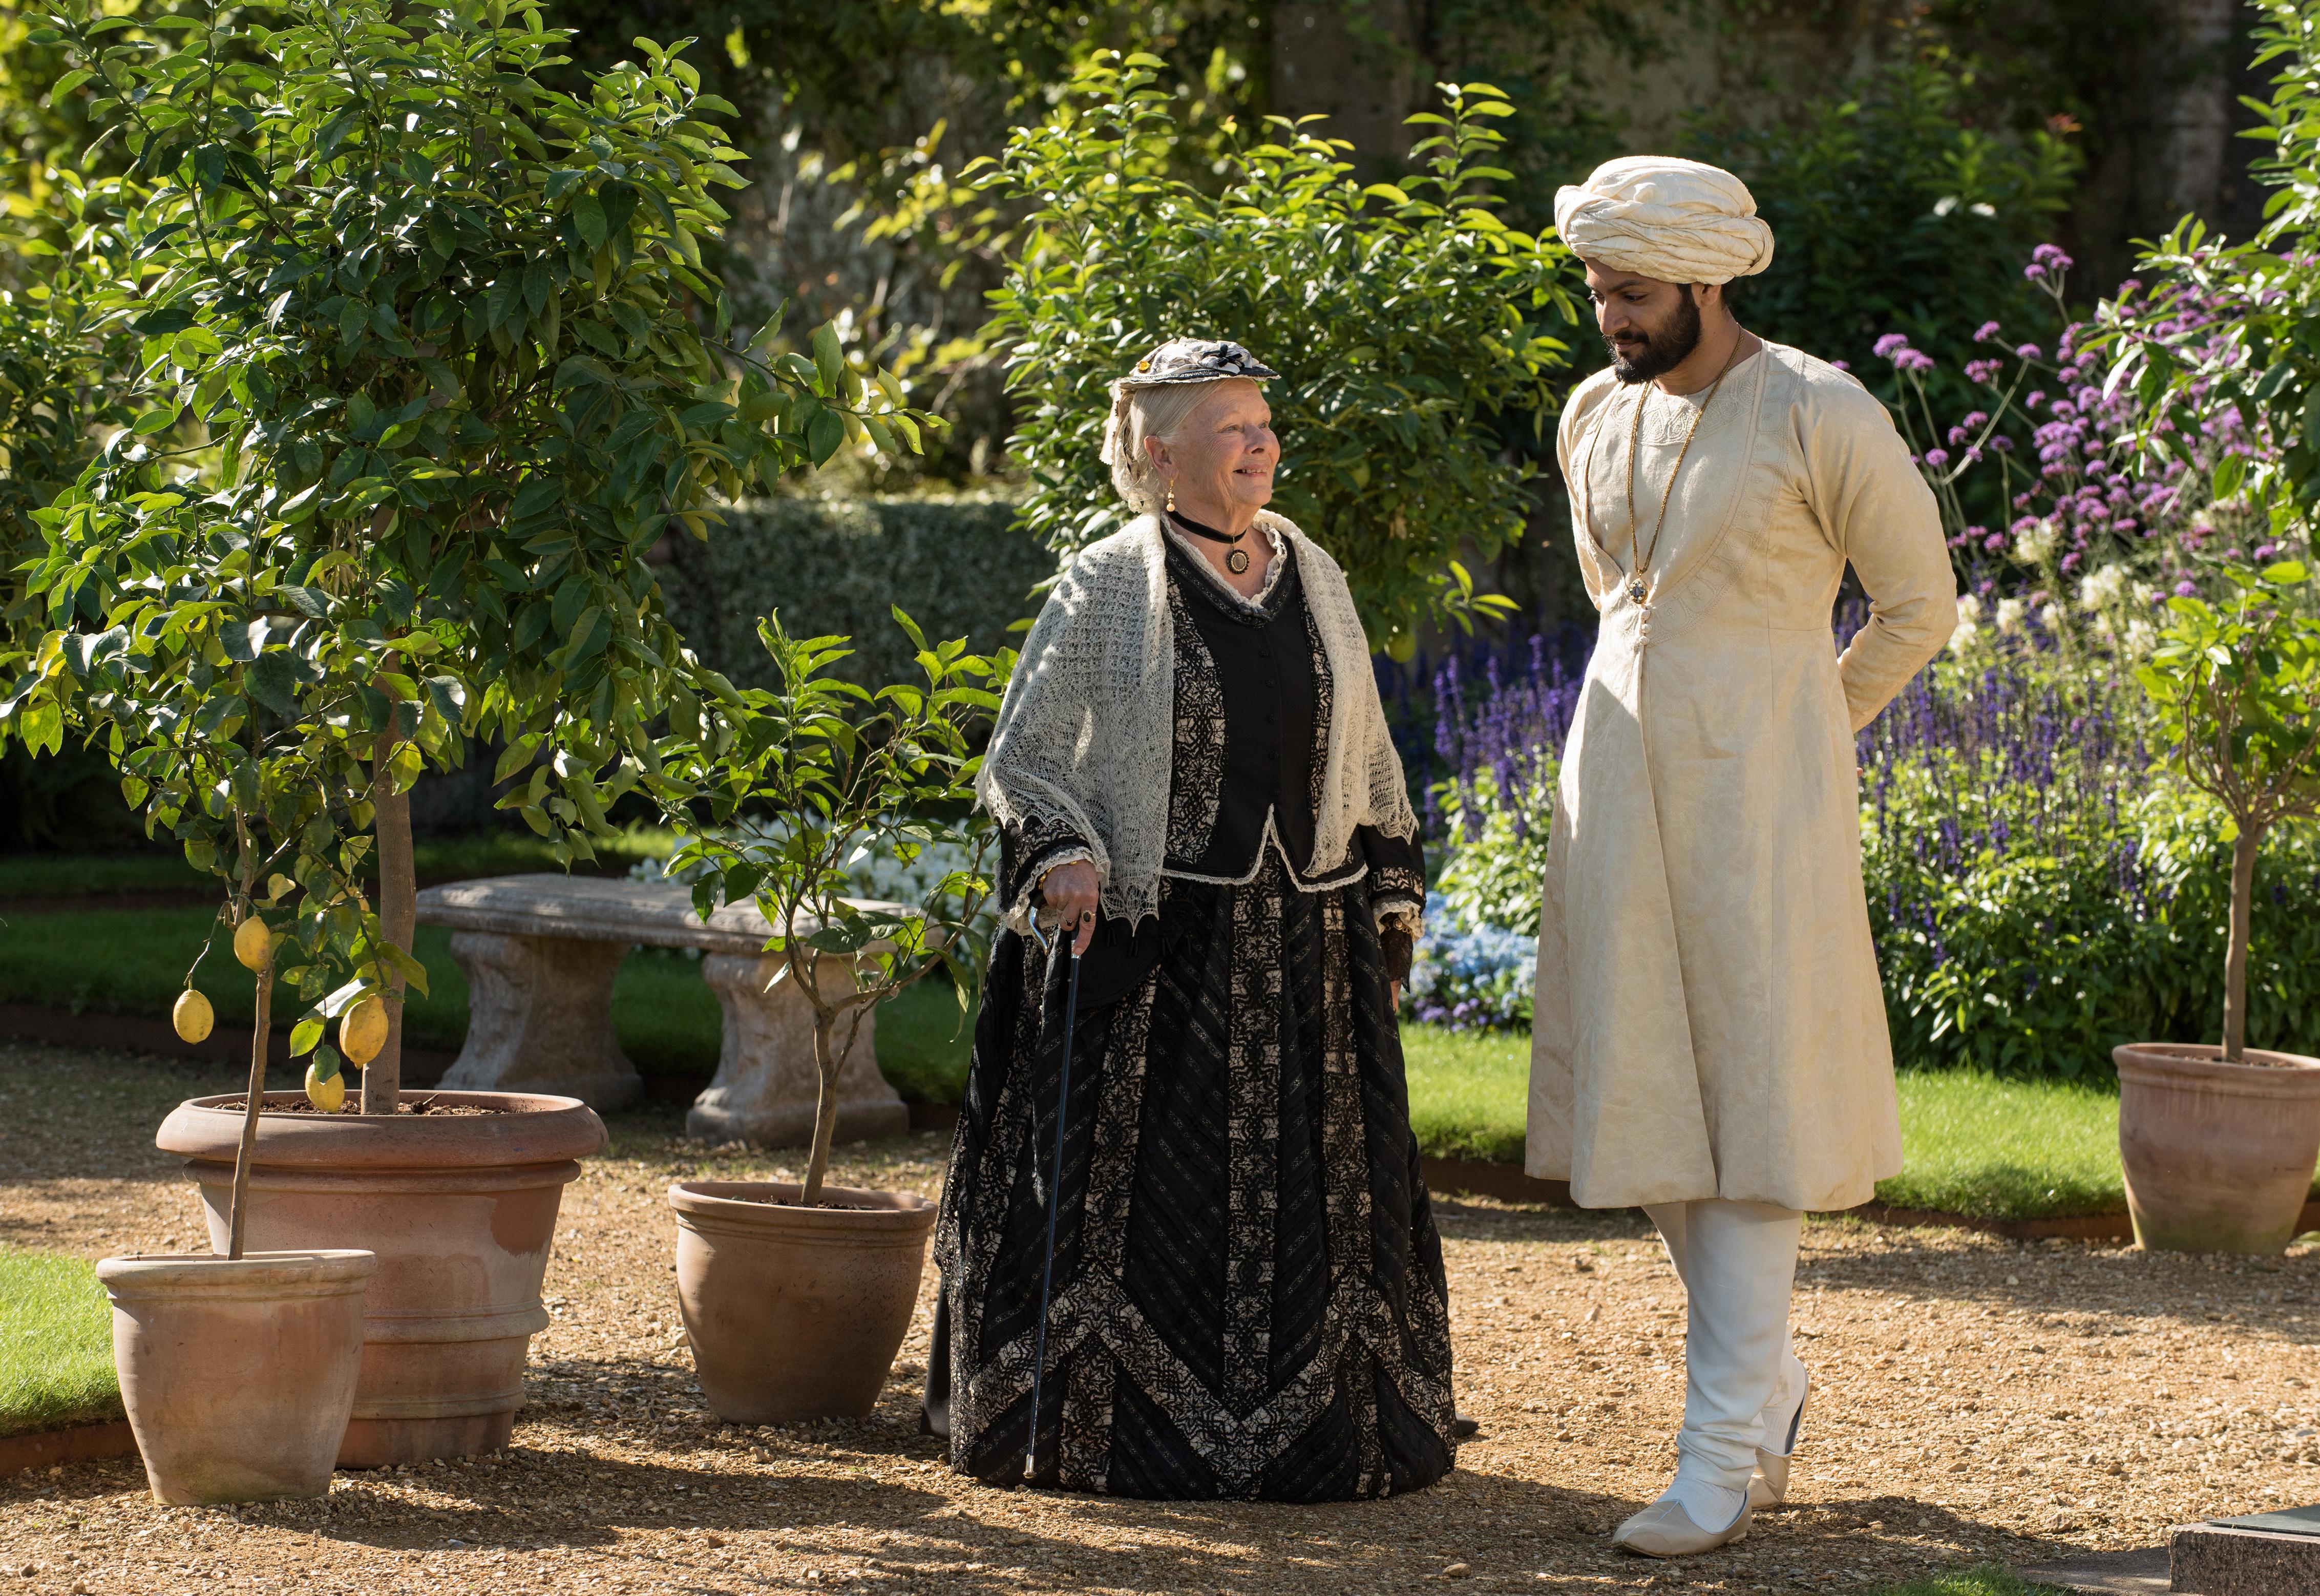 Judi Dench as Queen Victoria and Ali Fazal as Abdul Karim.